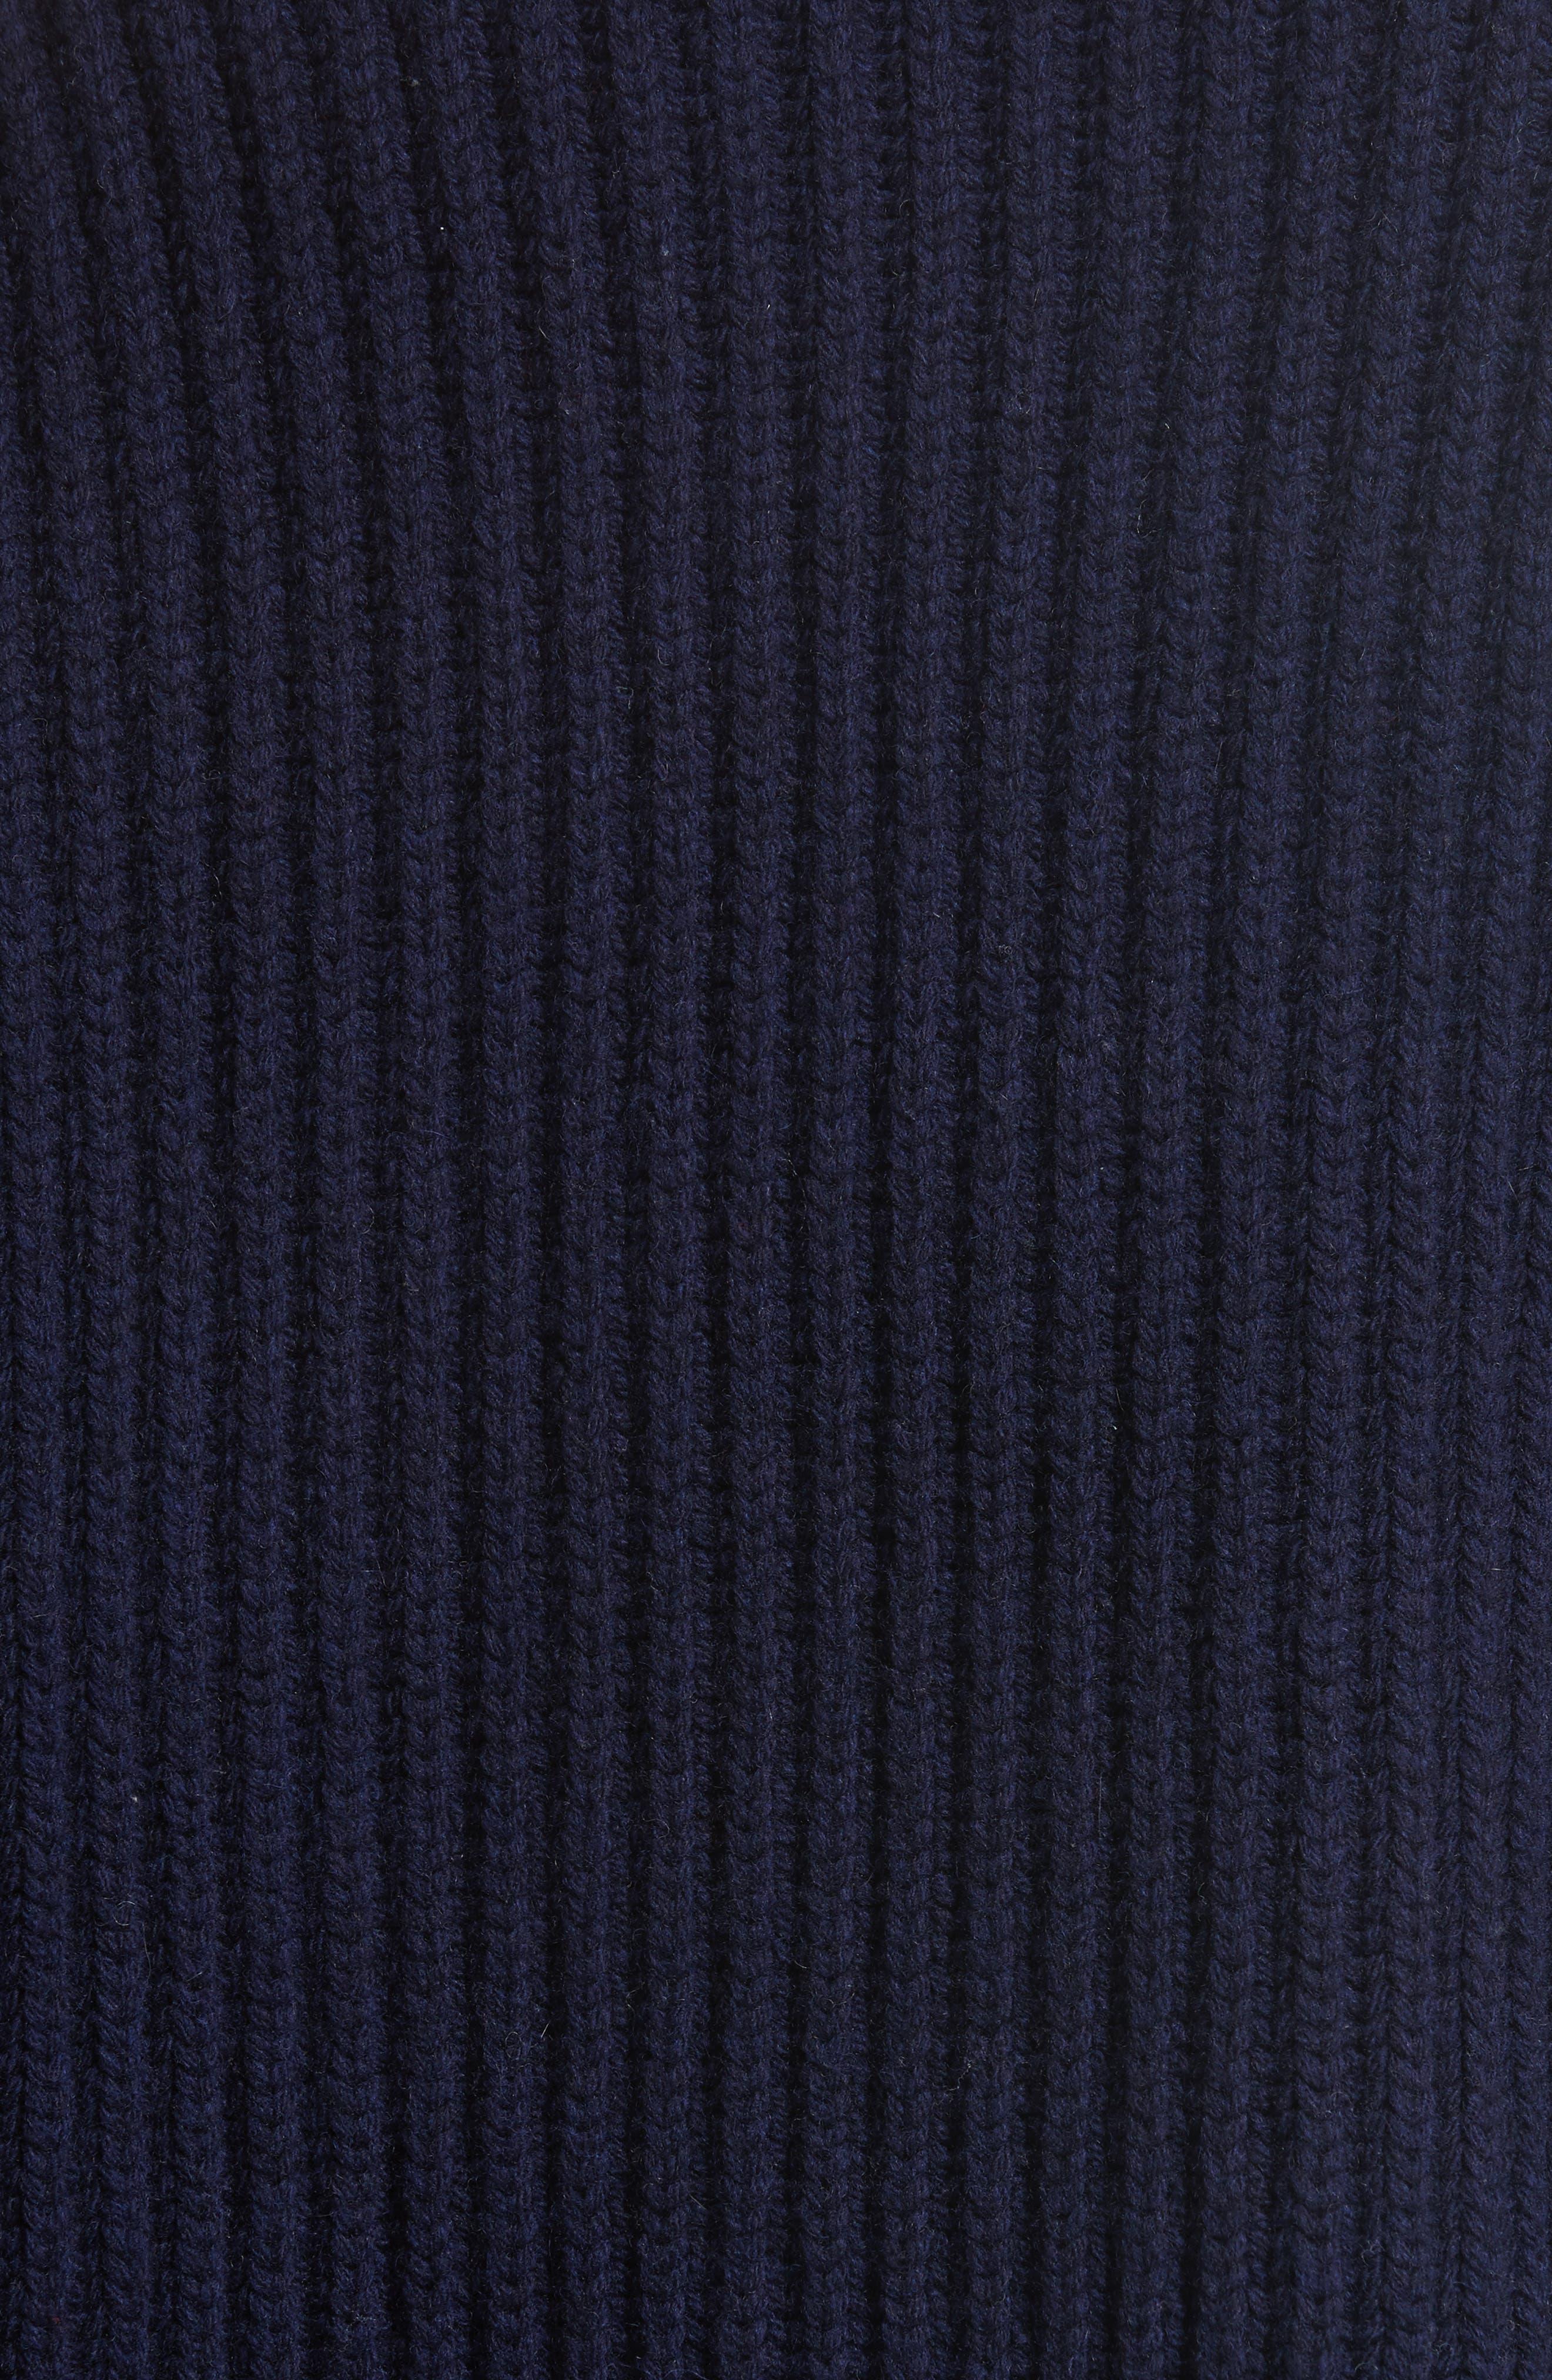 Crop Wool Sweater,                             Alternate thumbnail 3, color,                             Navy